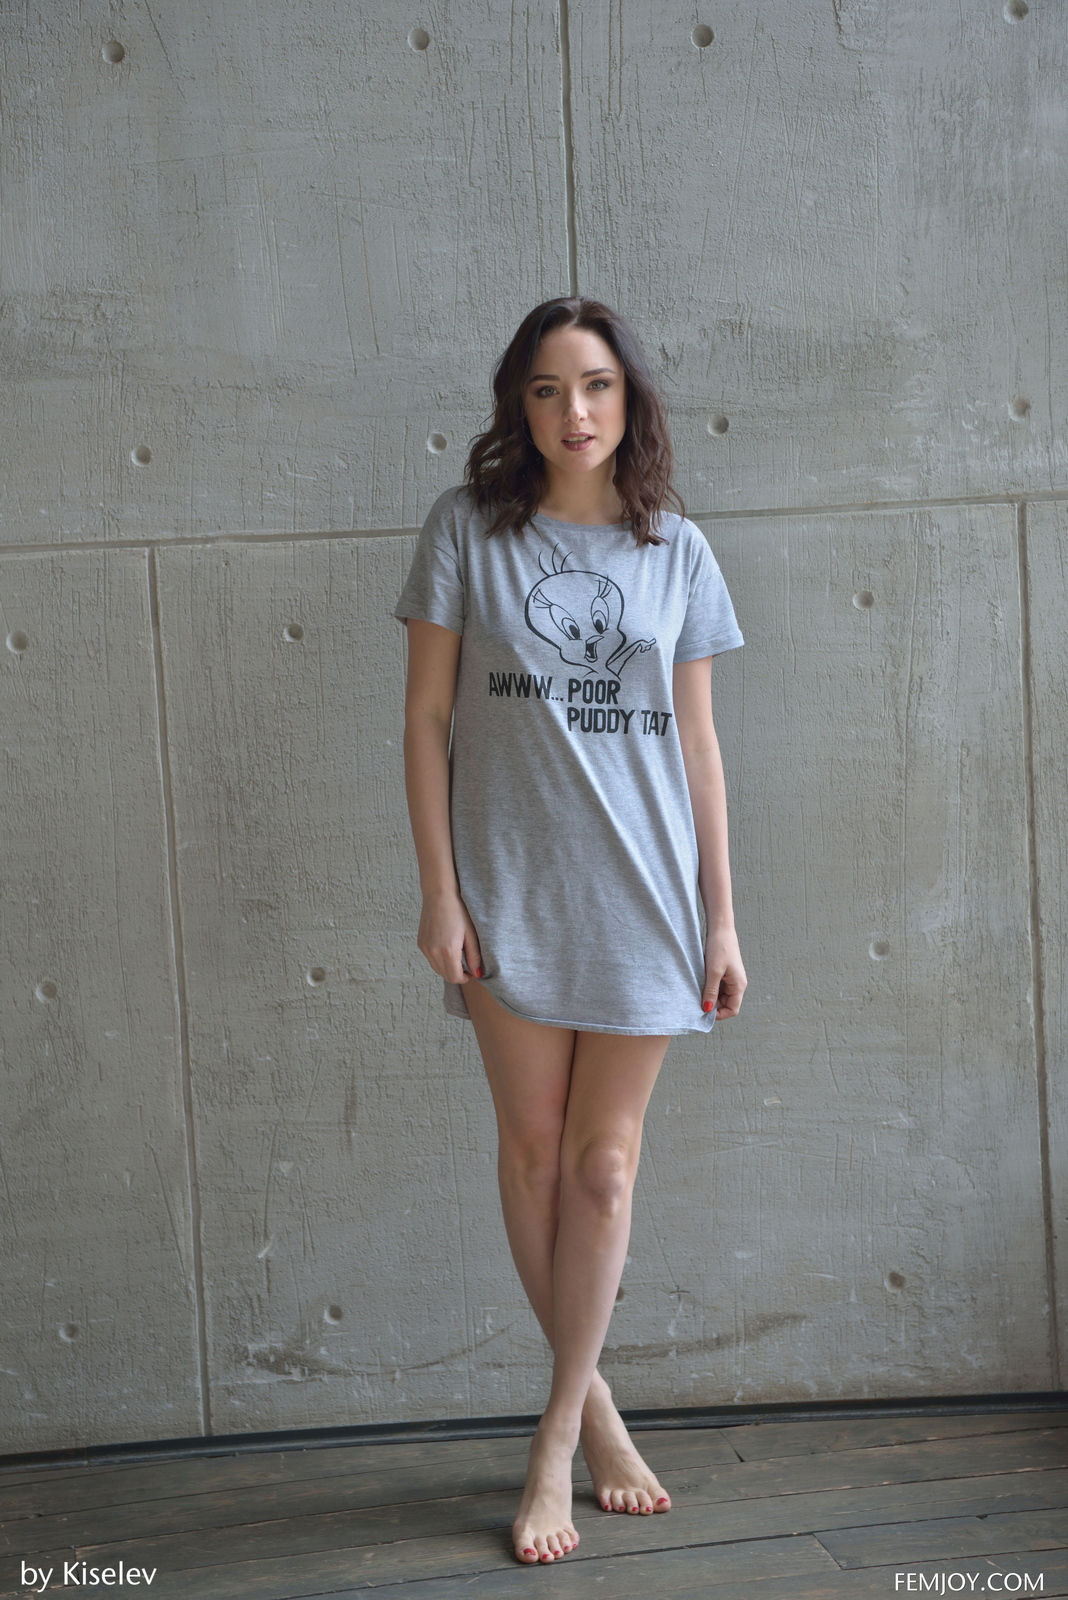 nika-a-naked-bottomless-grey-shirt-pussy-femjoy-01